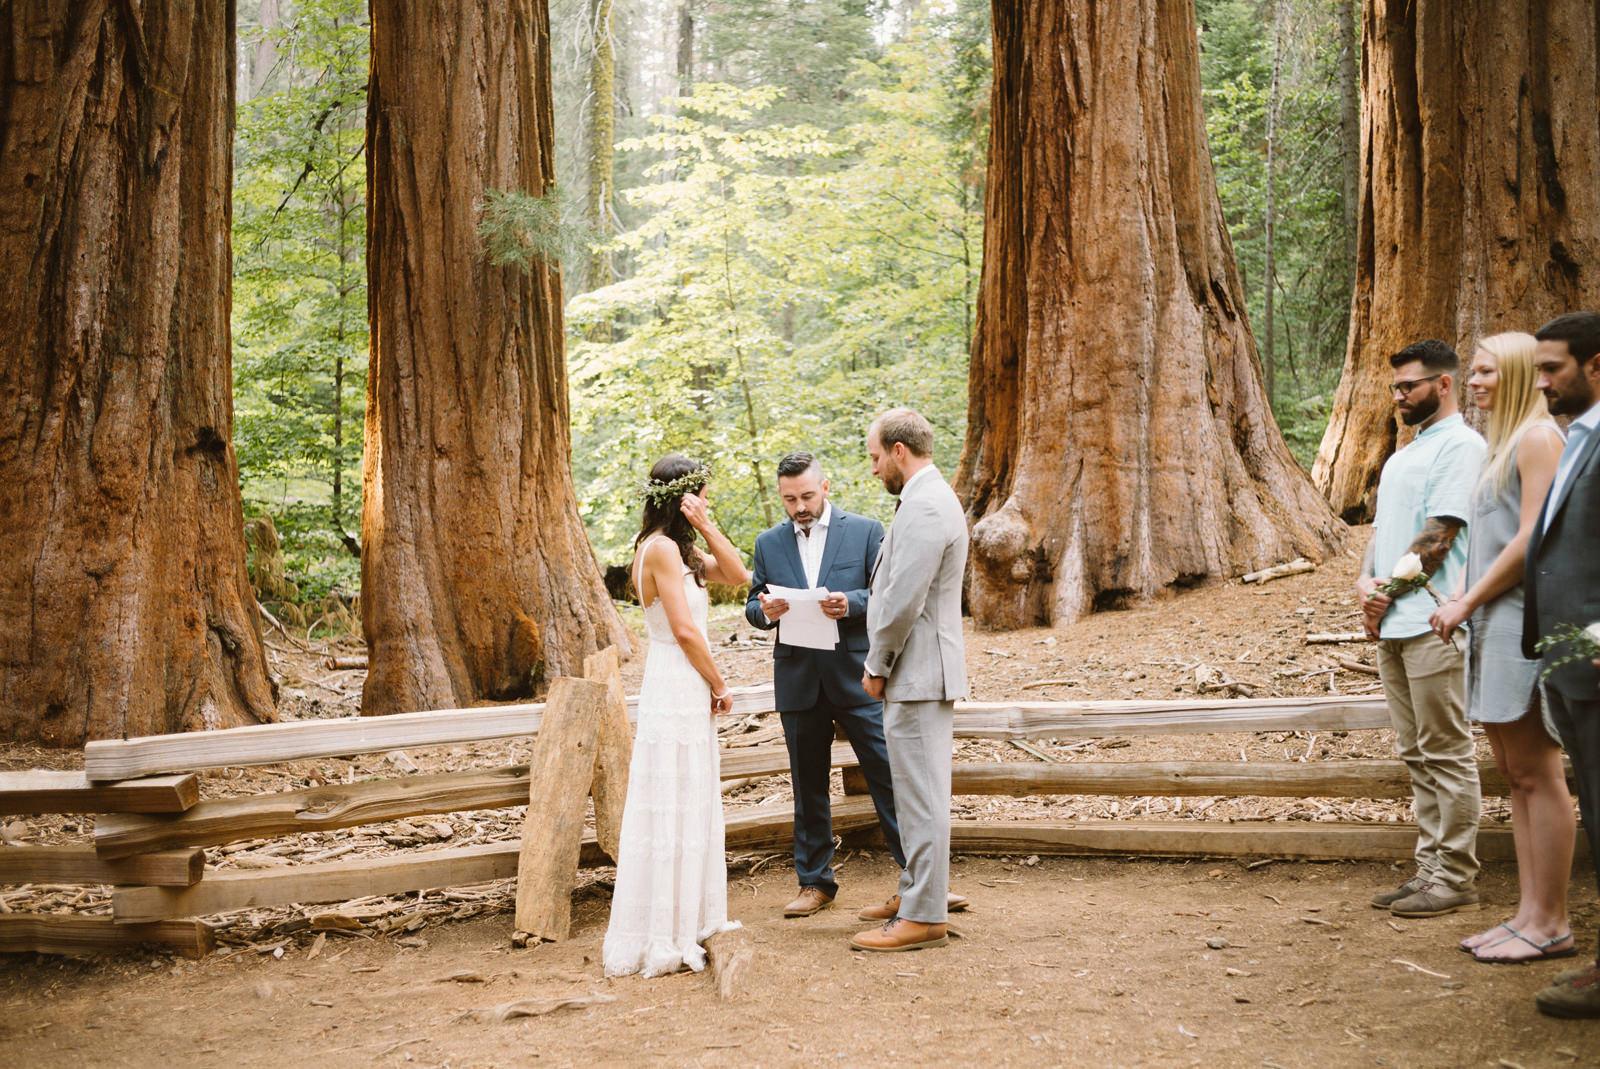 yosemite-intimate-wedding-056 YOSEMITE INTIMATE WEDDING